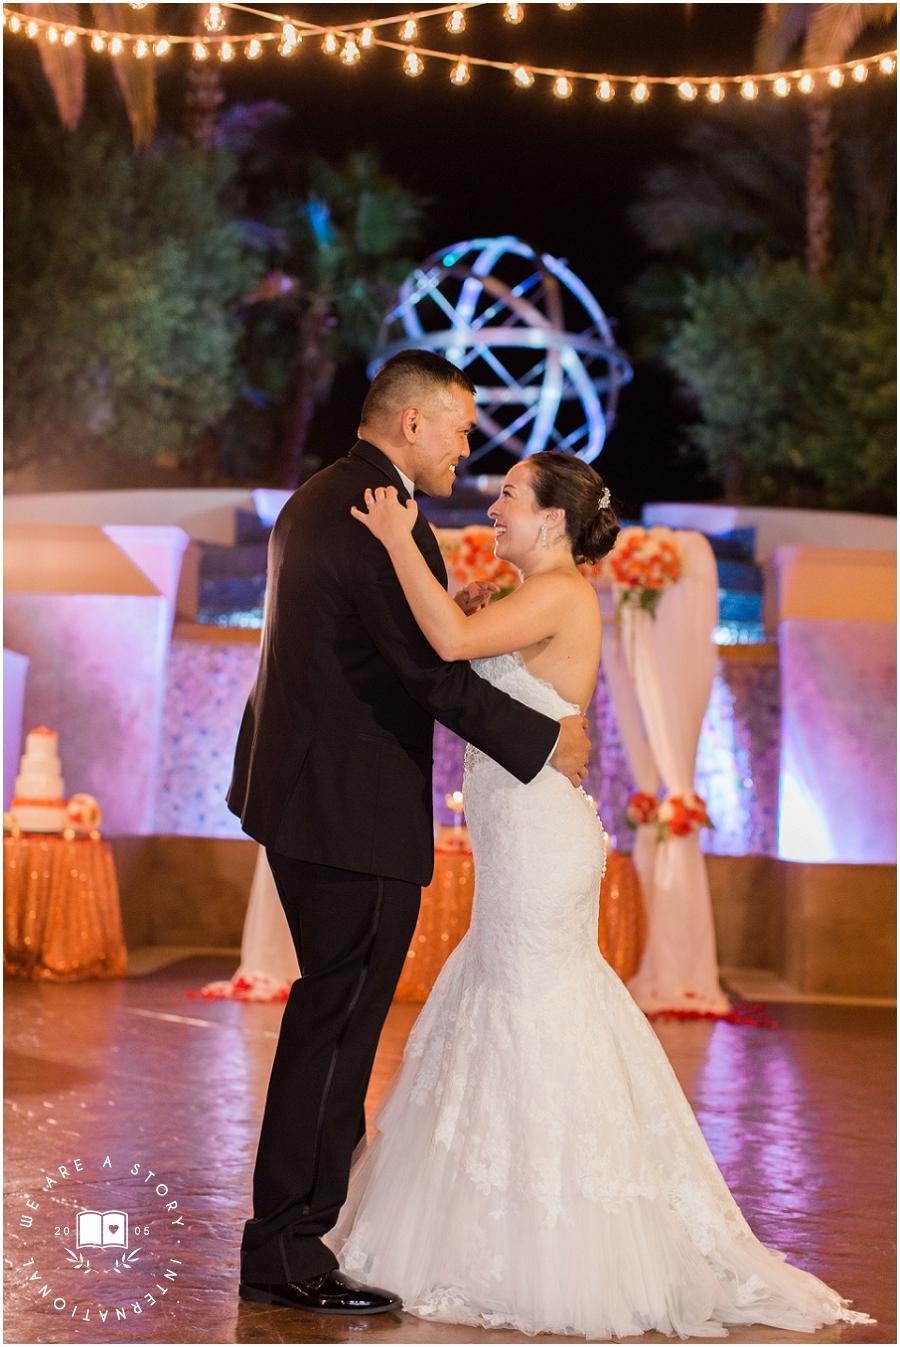 Four Seasons wedding photographer Las Vegas _ We Are A Story wedding photographer_2501.jpg